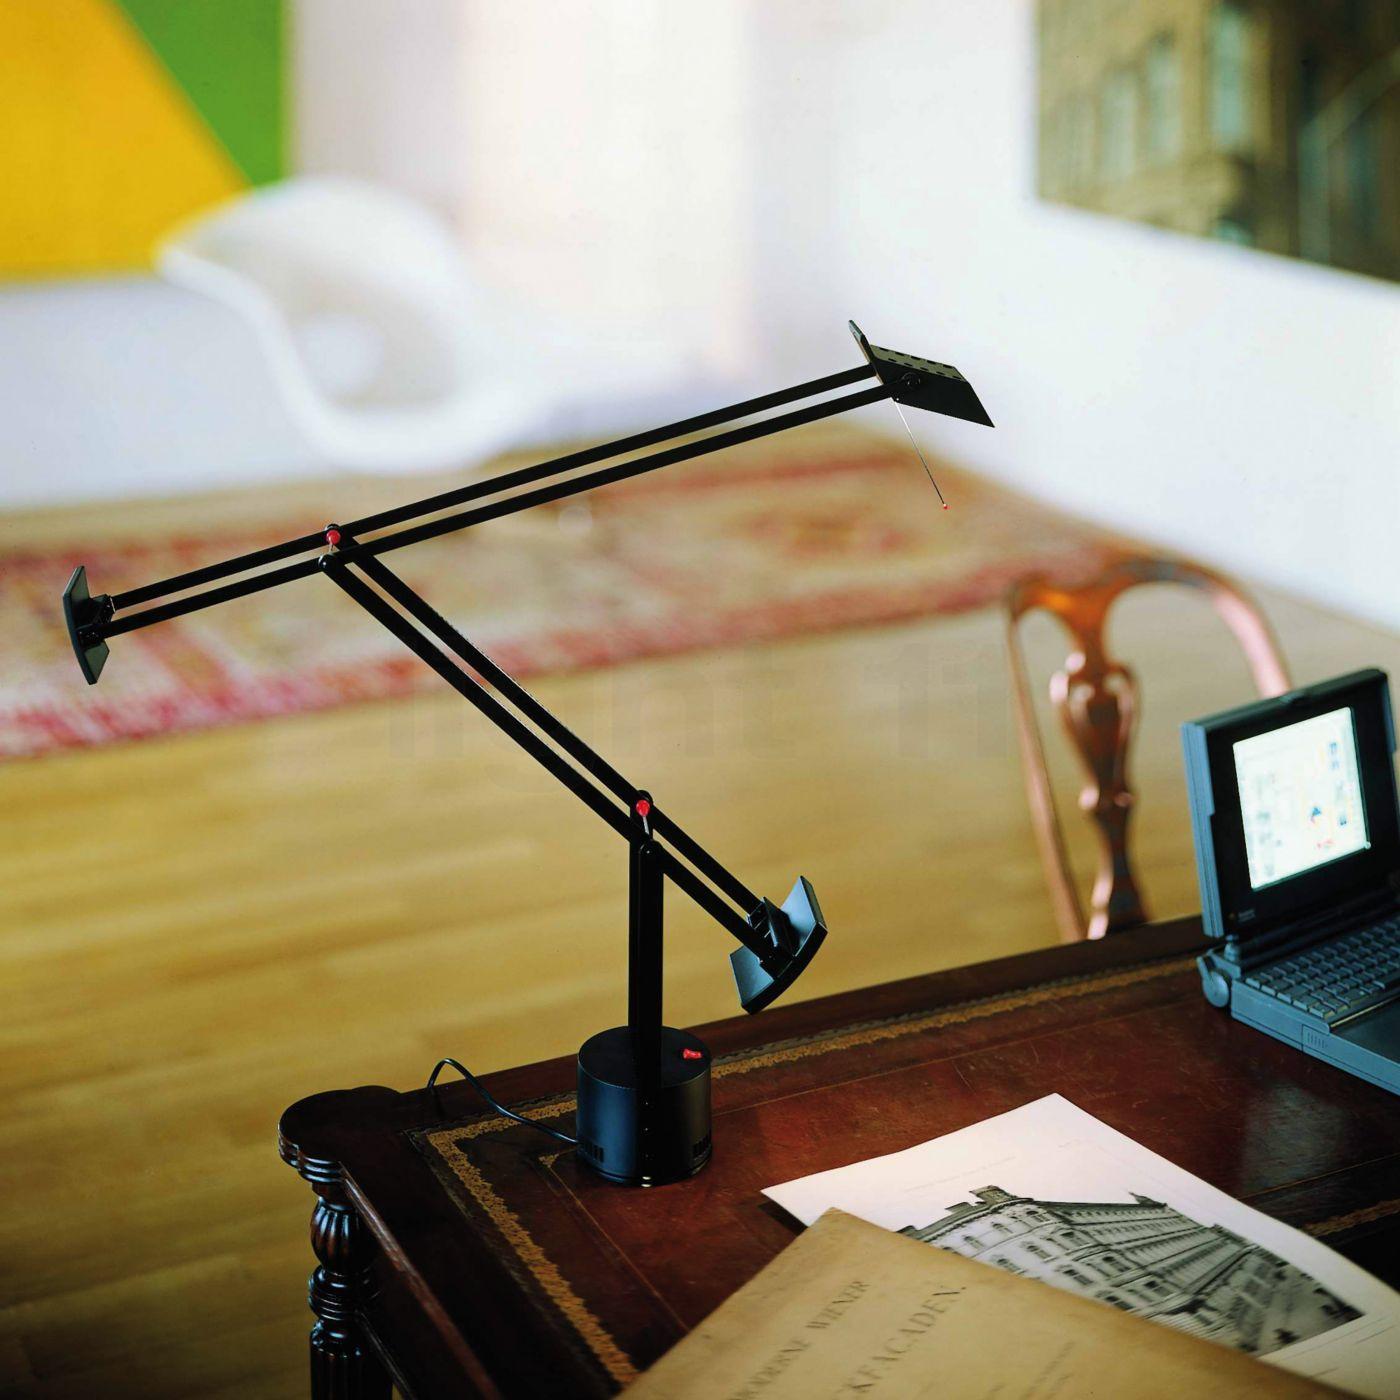 artemide tizio  workplace lamps buy at lighteu -